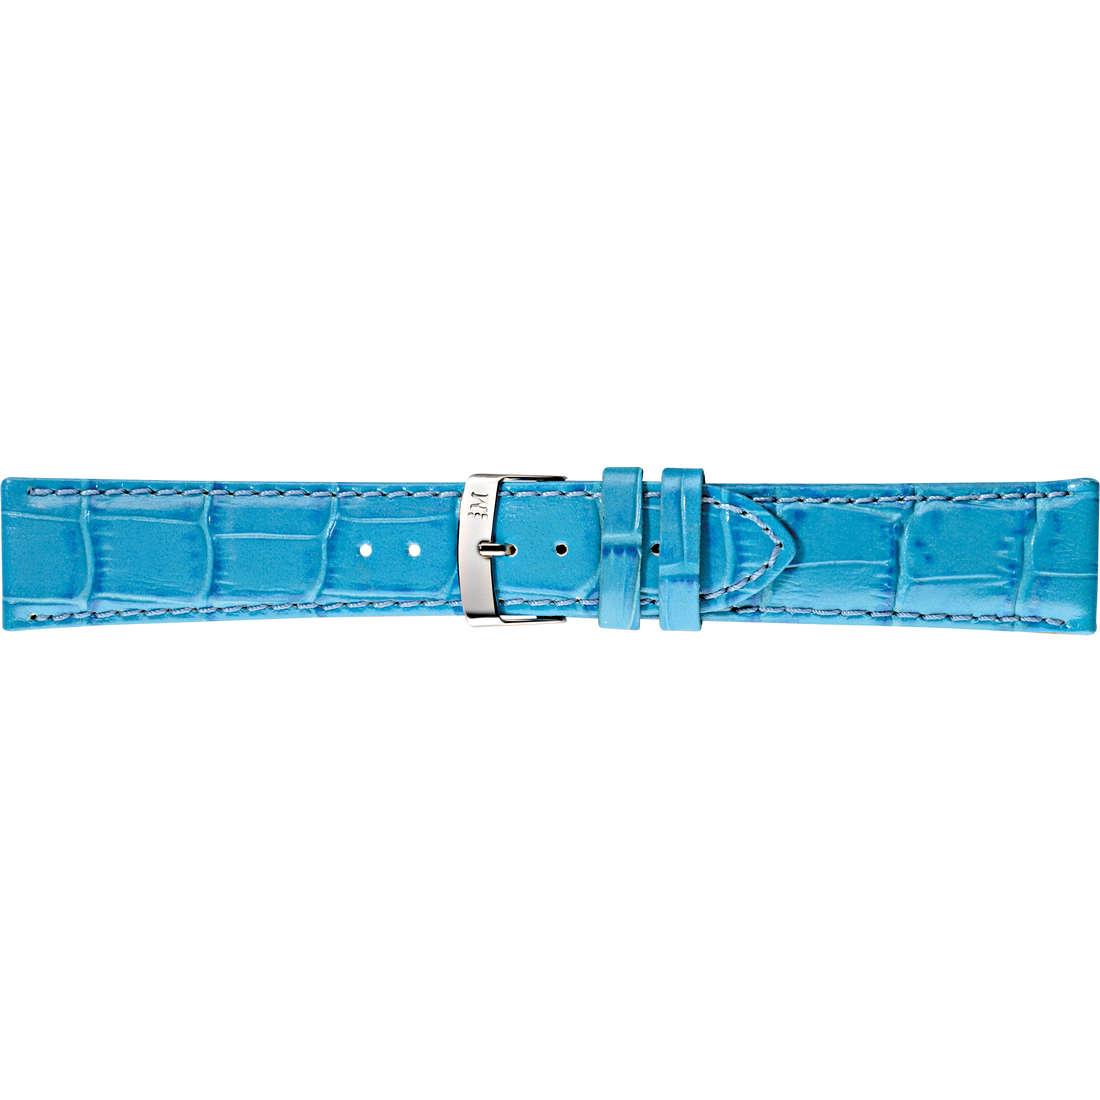 watch watch bands watch straps woman Morellato Morellato 1930 A01D3078656166CR20